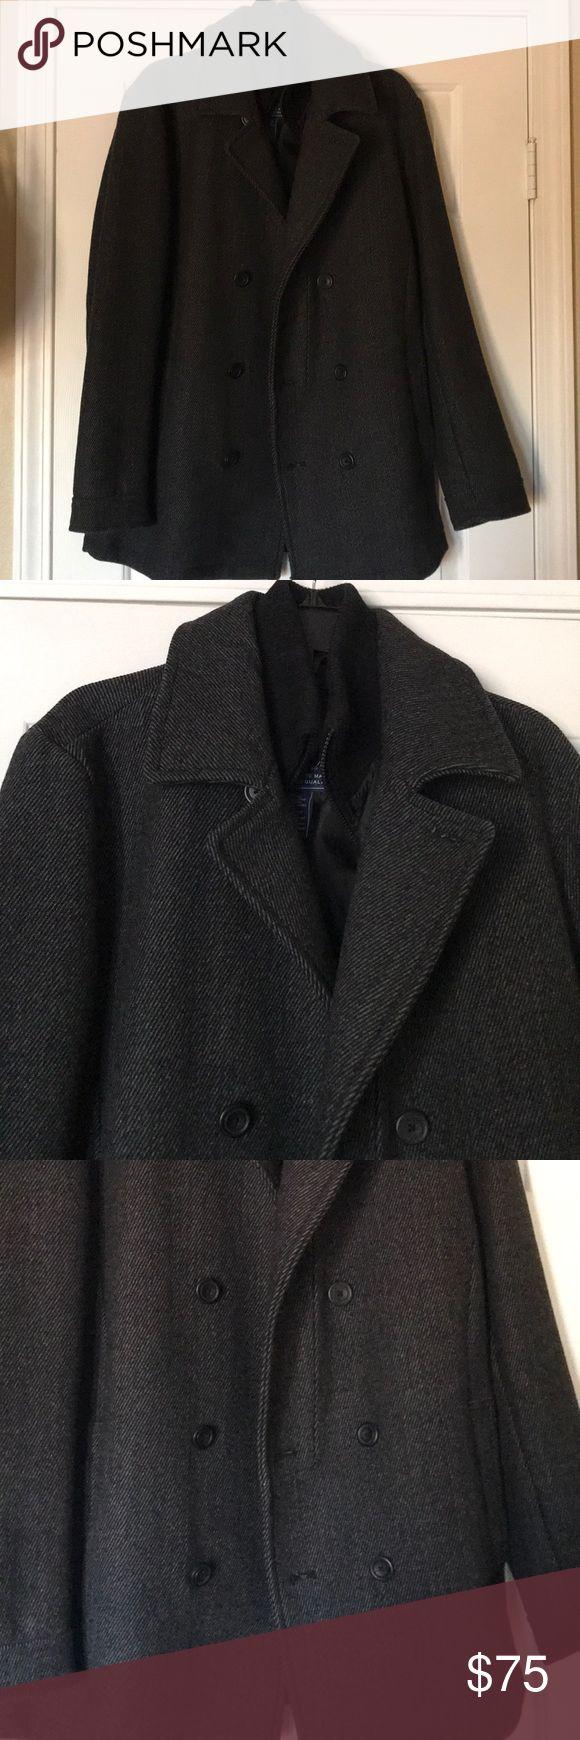 "American Rag Coat Men's Medium American Rag Coat Men's Medium, Grey,Inside Zip, Length 32"", Chest 42"", Sleeve 26"", Perfect Condition American Rag Jackets & Coats Pea Coats"